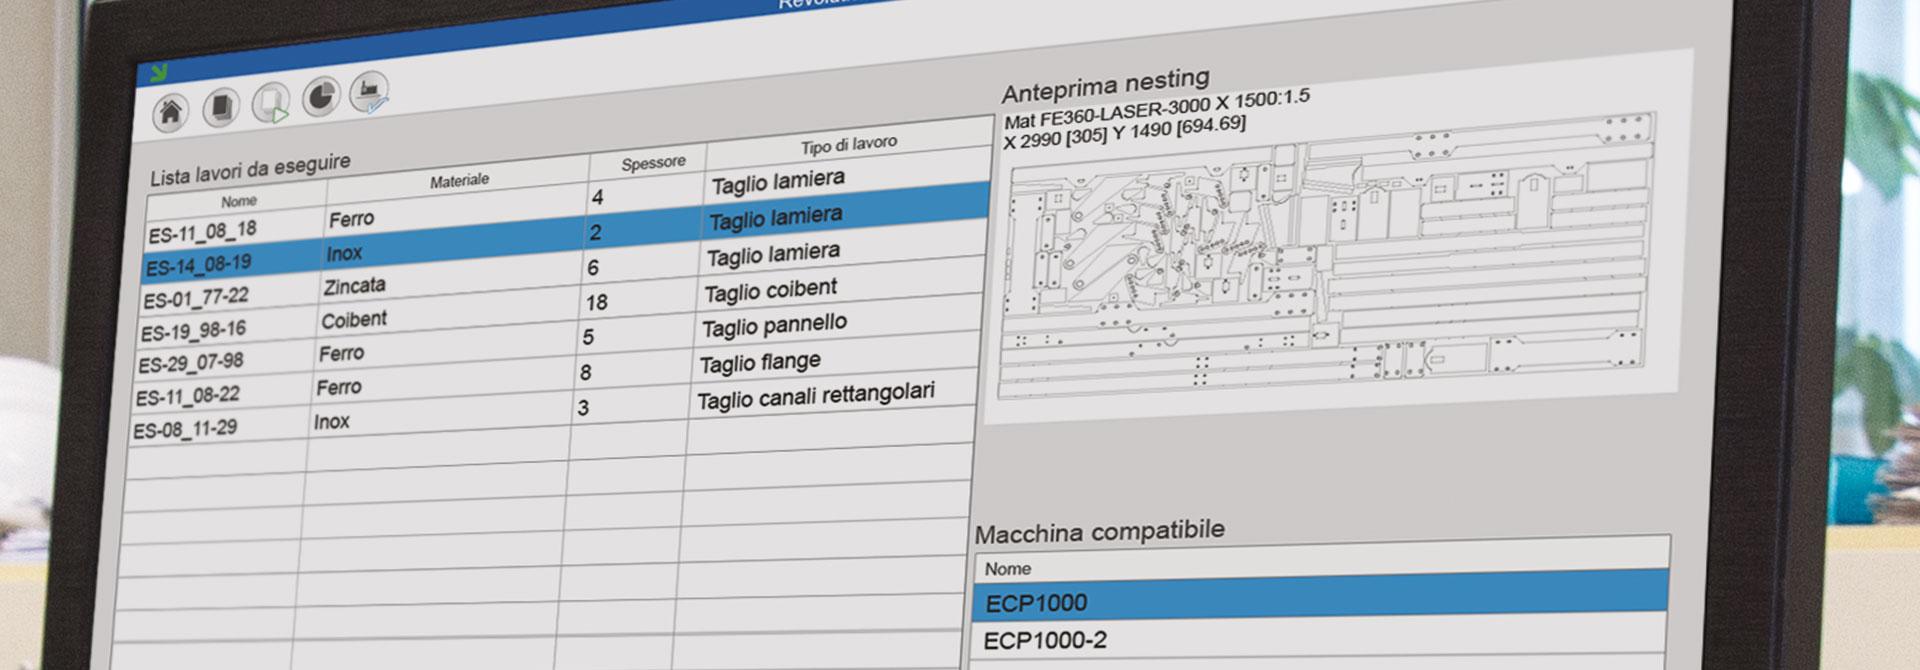 image slide of program - immagine slide del programma